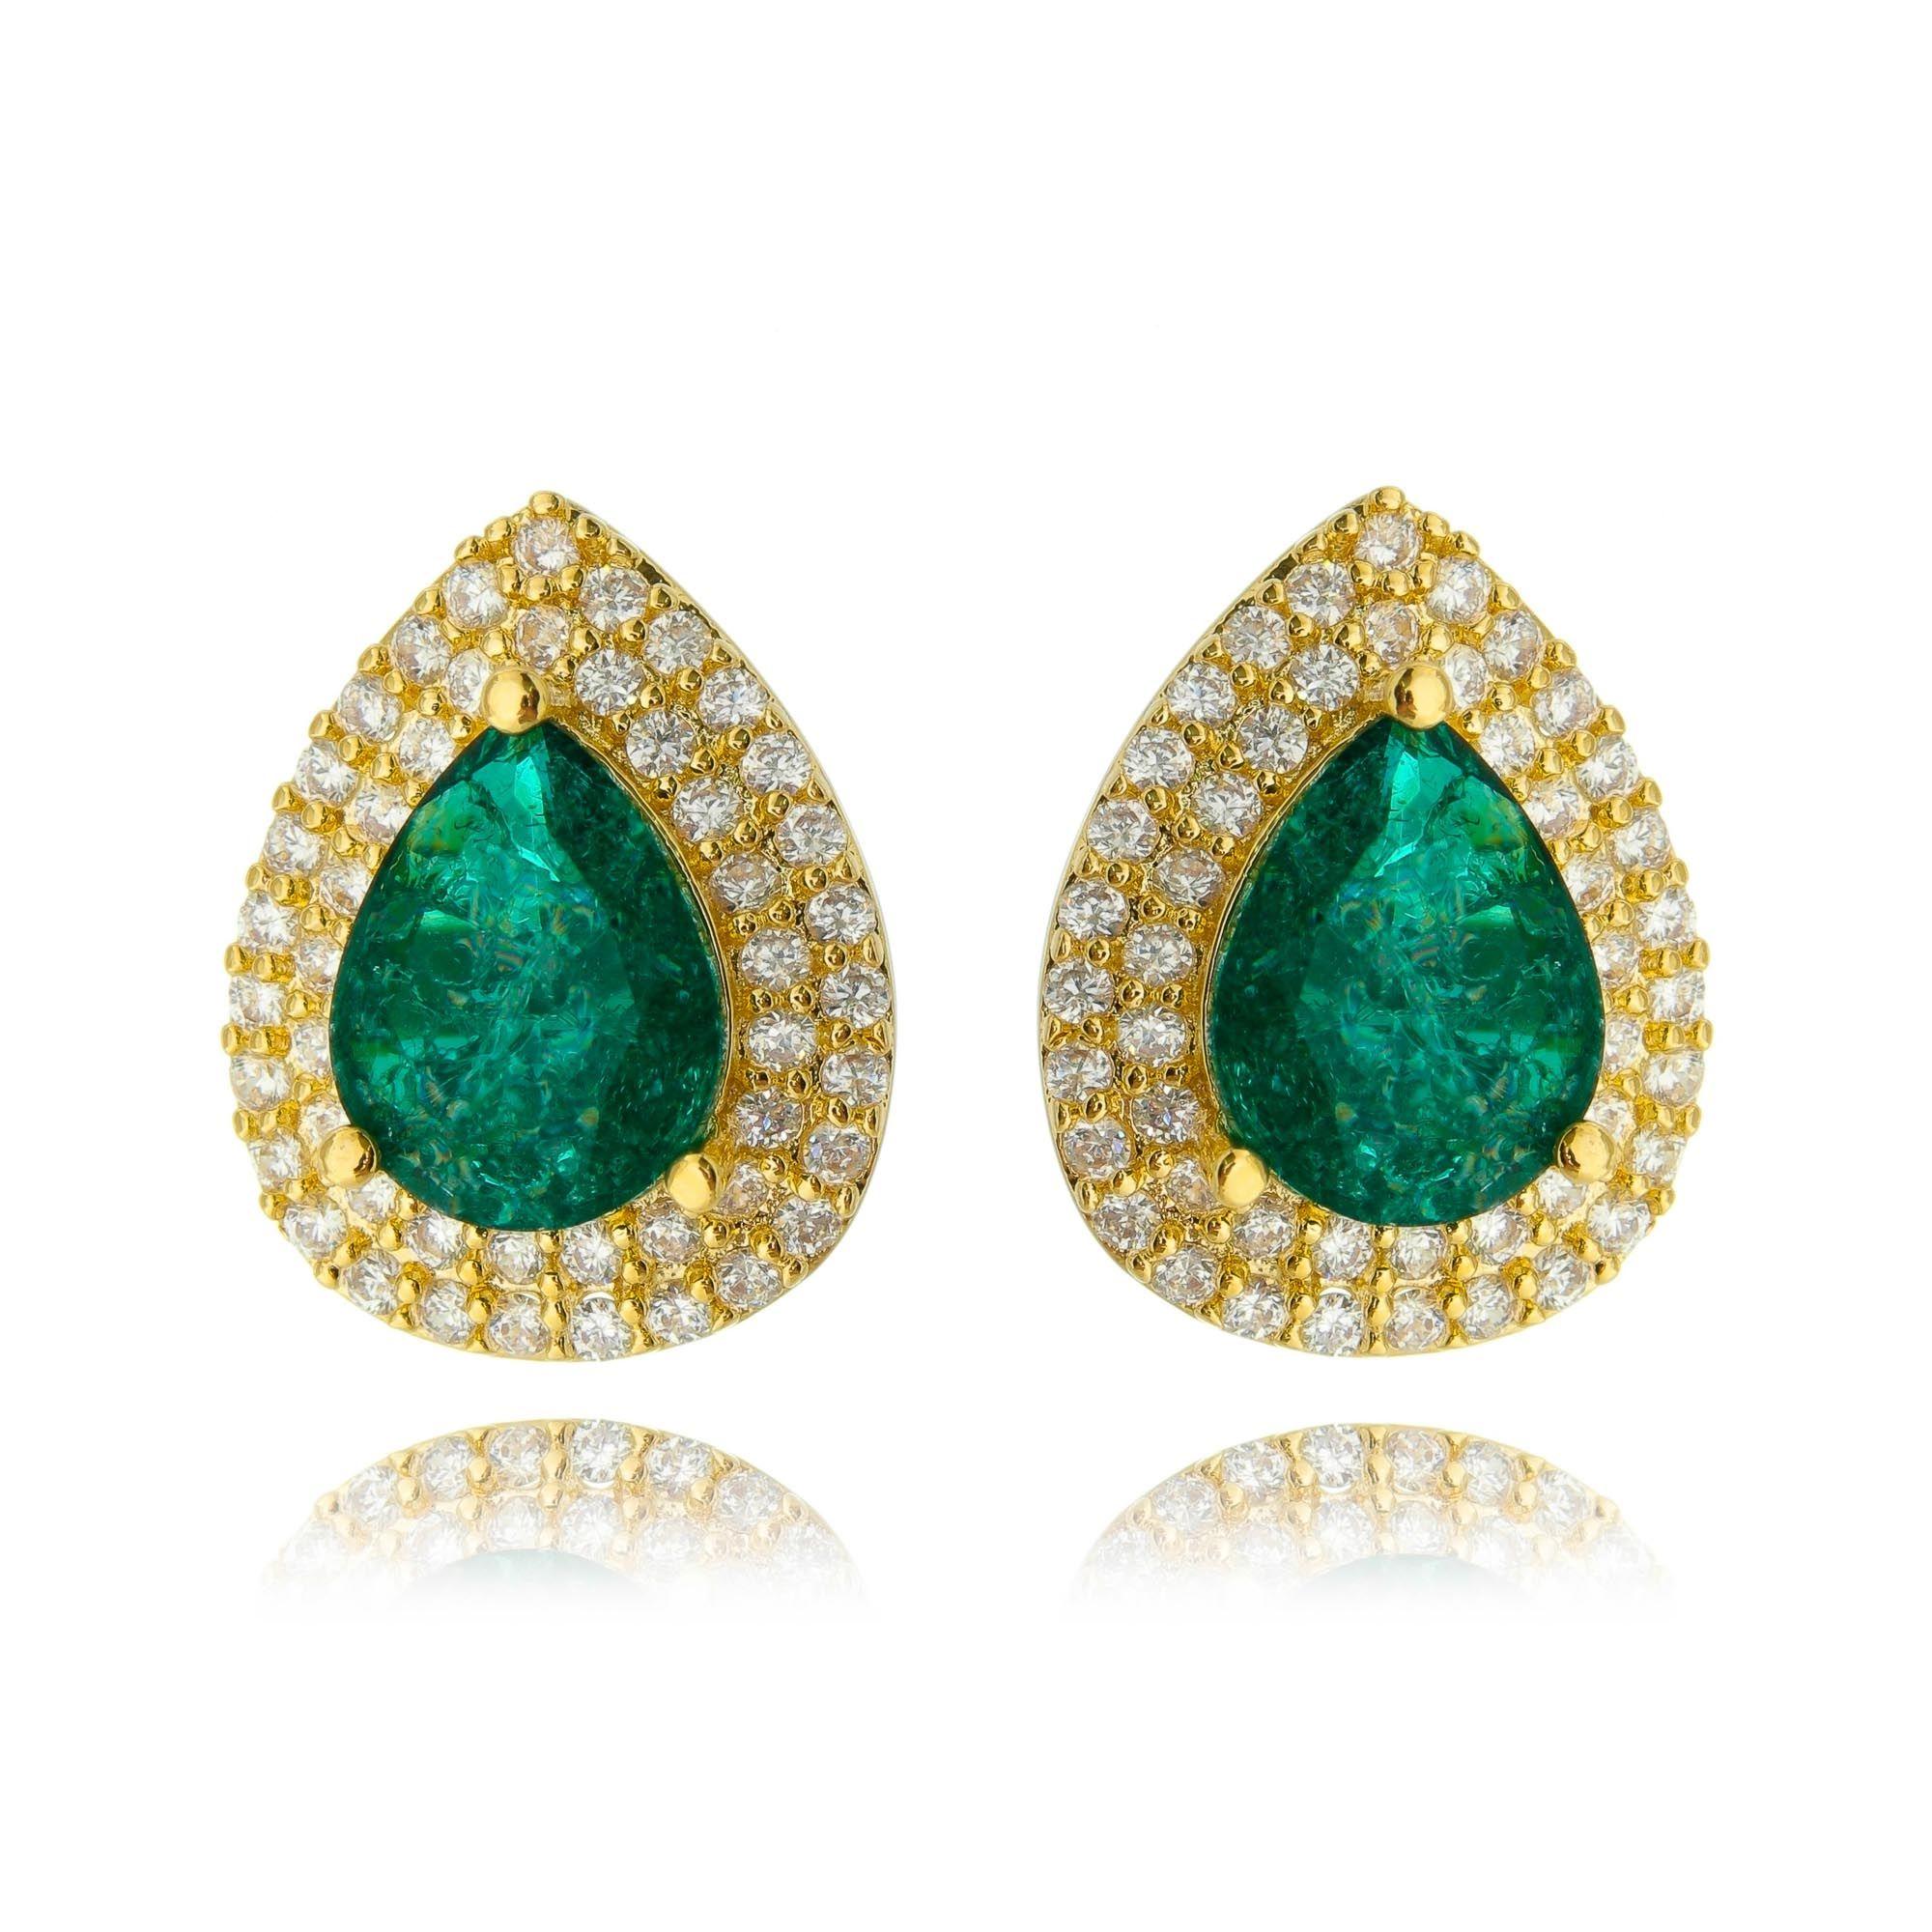 Brinco Gota Fusion Esmeralda com 2 Molduras de Zircônia Cristal Semijoia Ouro  - Soloyou